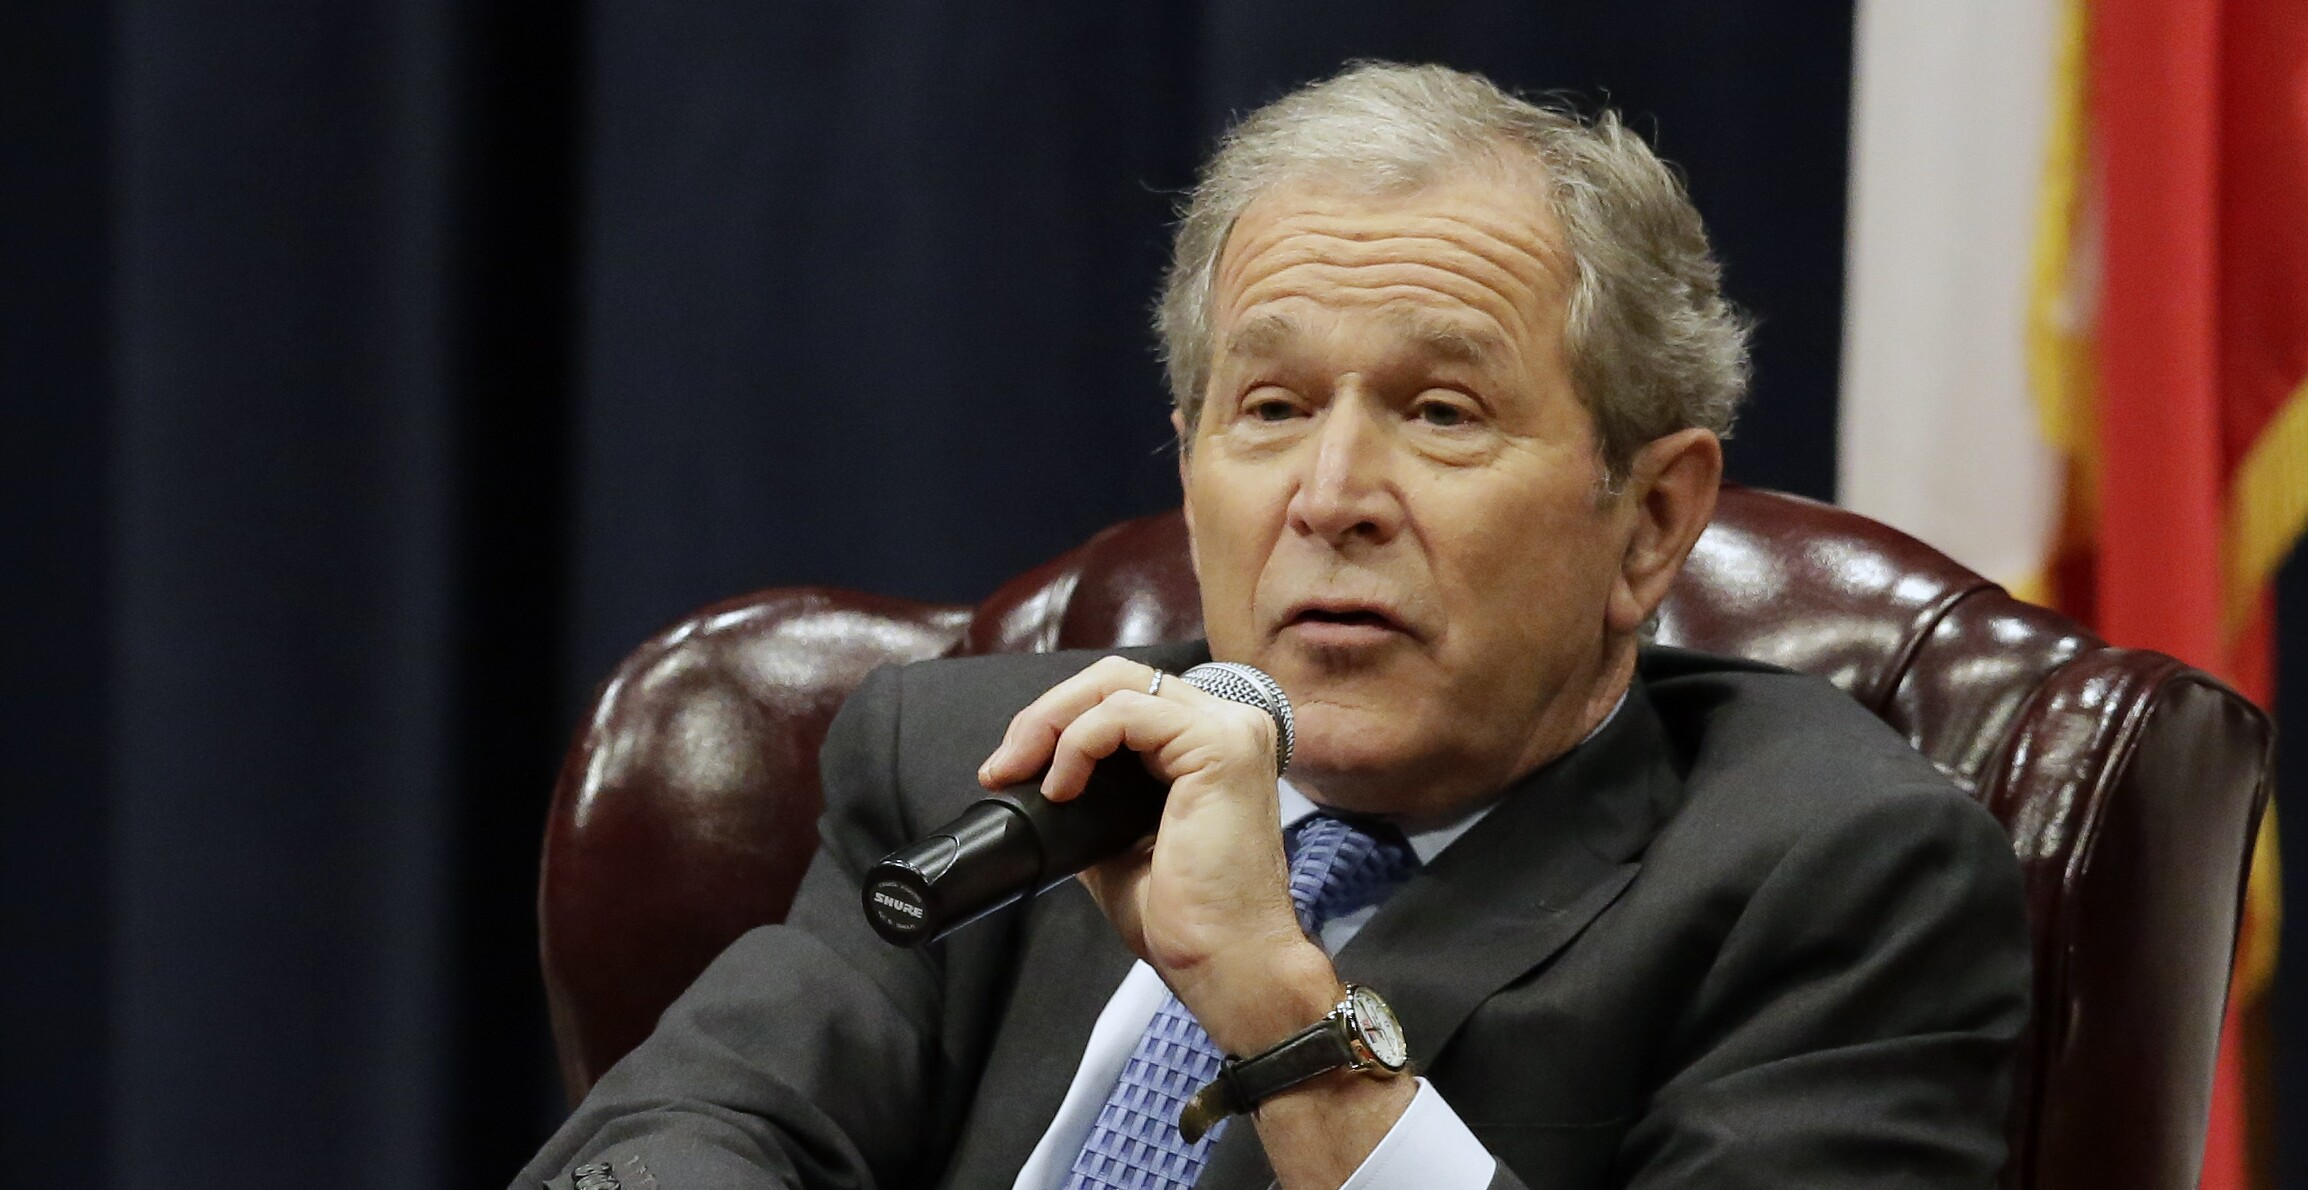 George W Bush Flubs Winston Churchill Quote